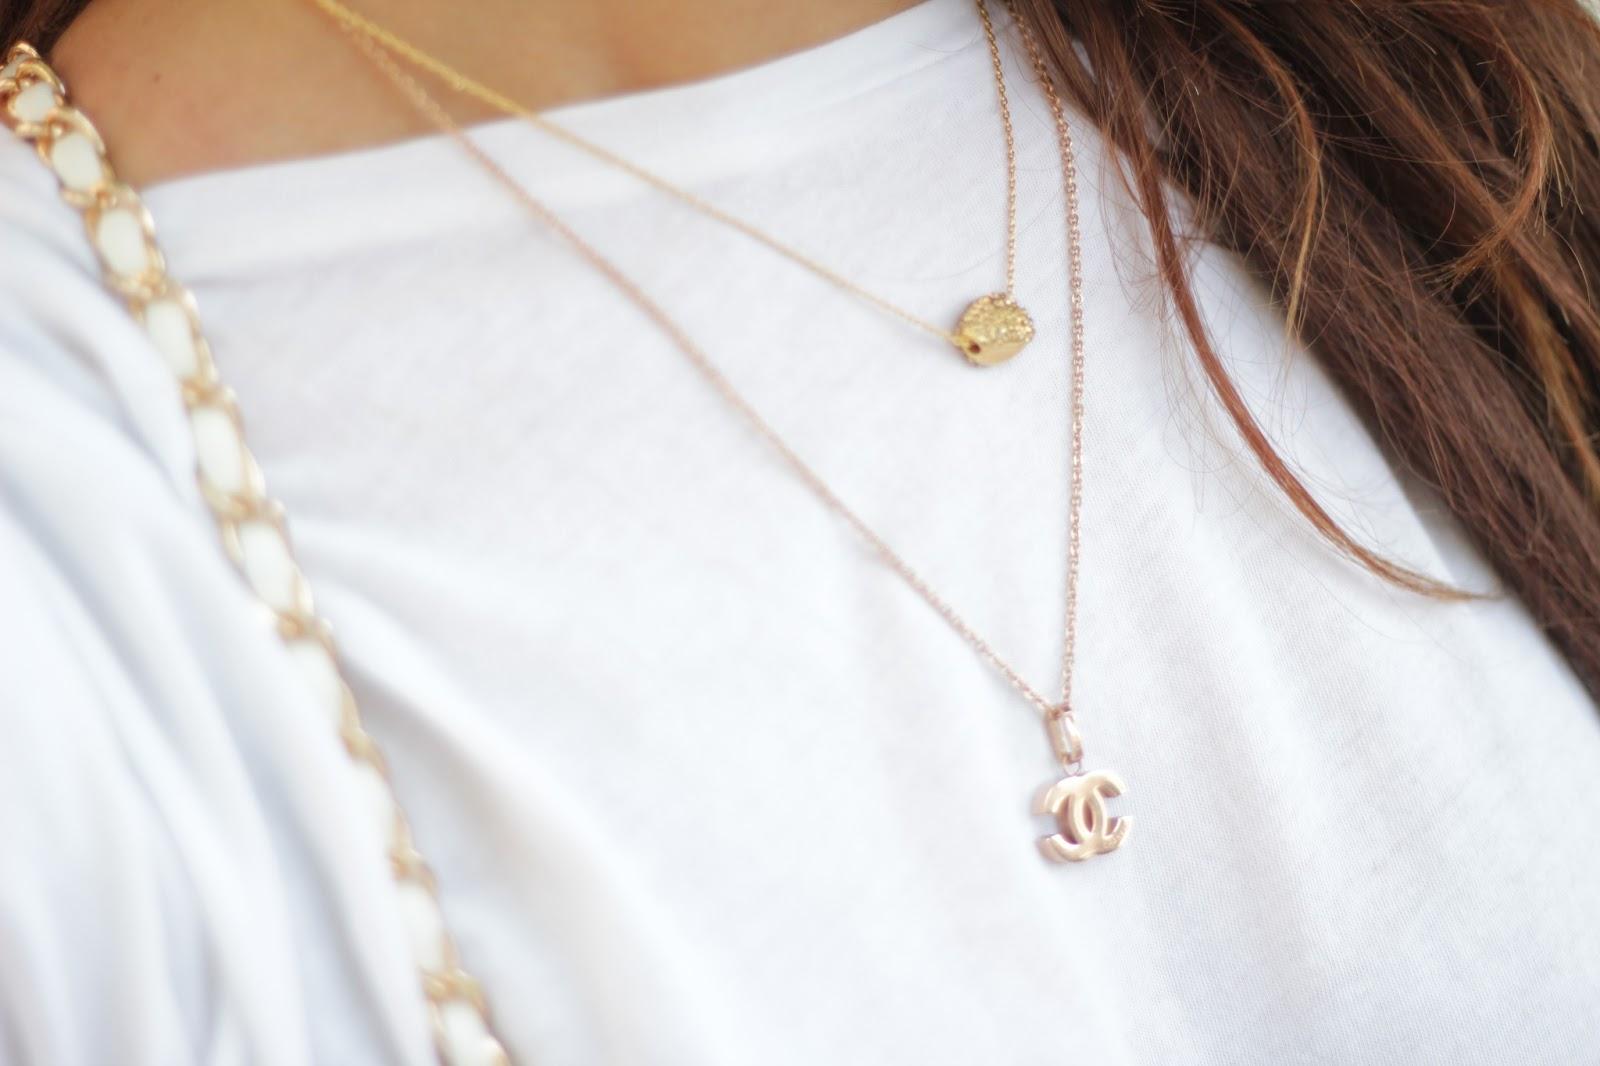 My Pame' Designs Jewellery